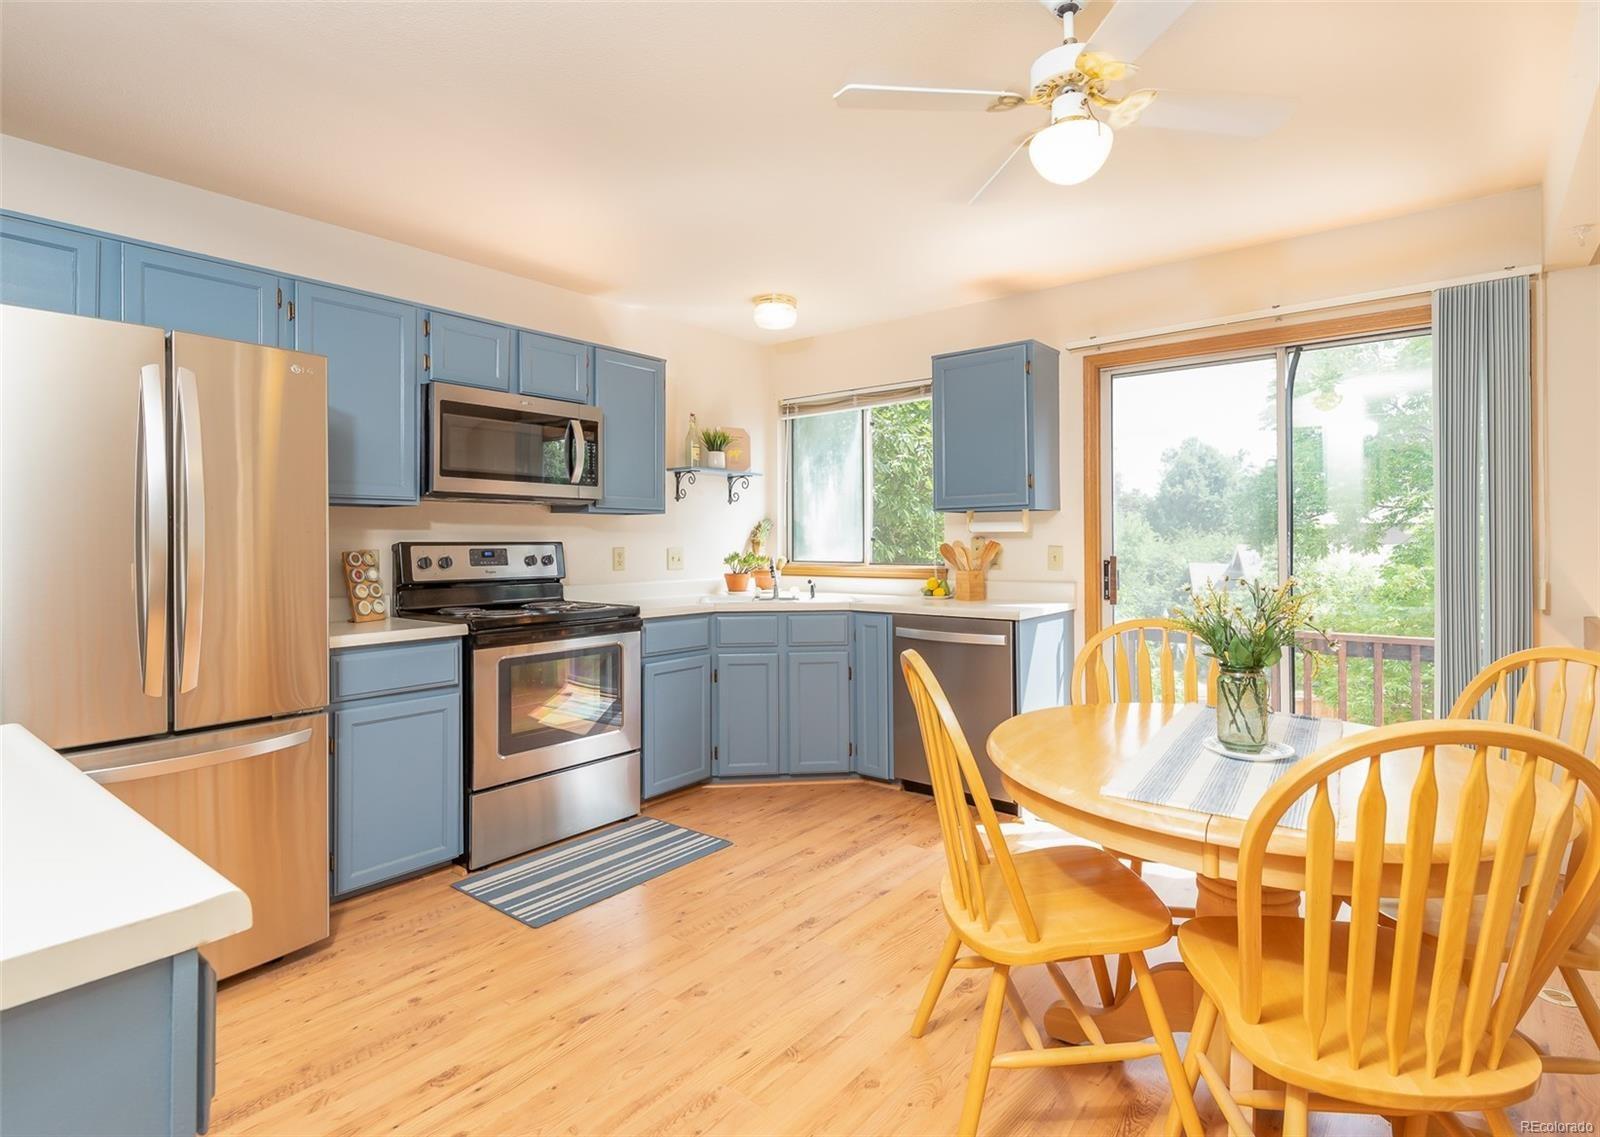 MLS# 8721784 - 1 - 684  Walden Court, Highlands Ranch, CO 80126